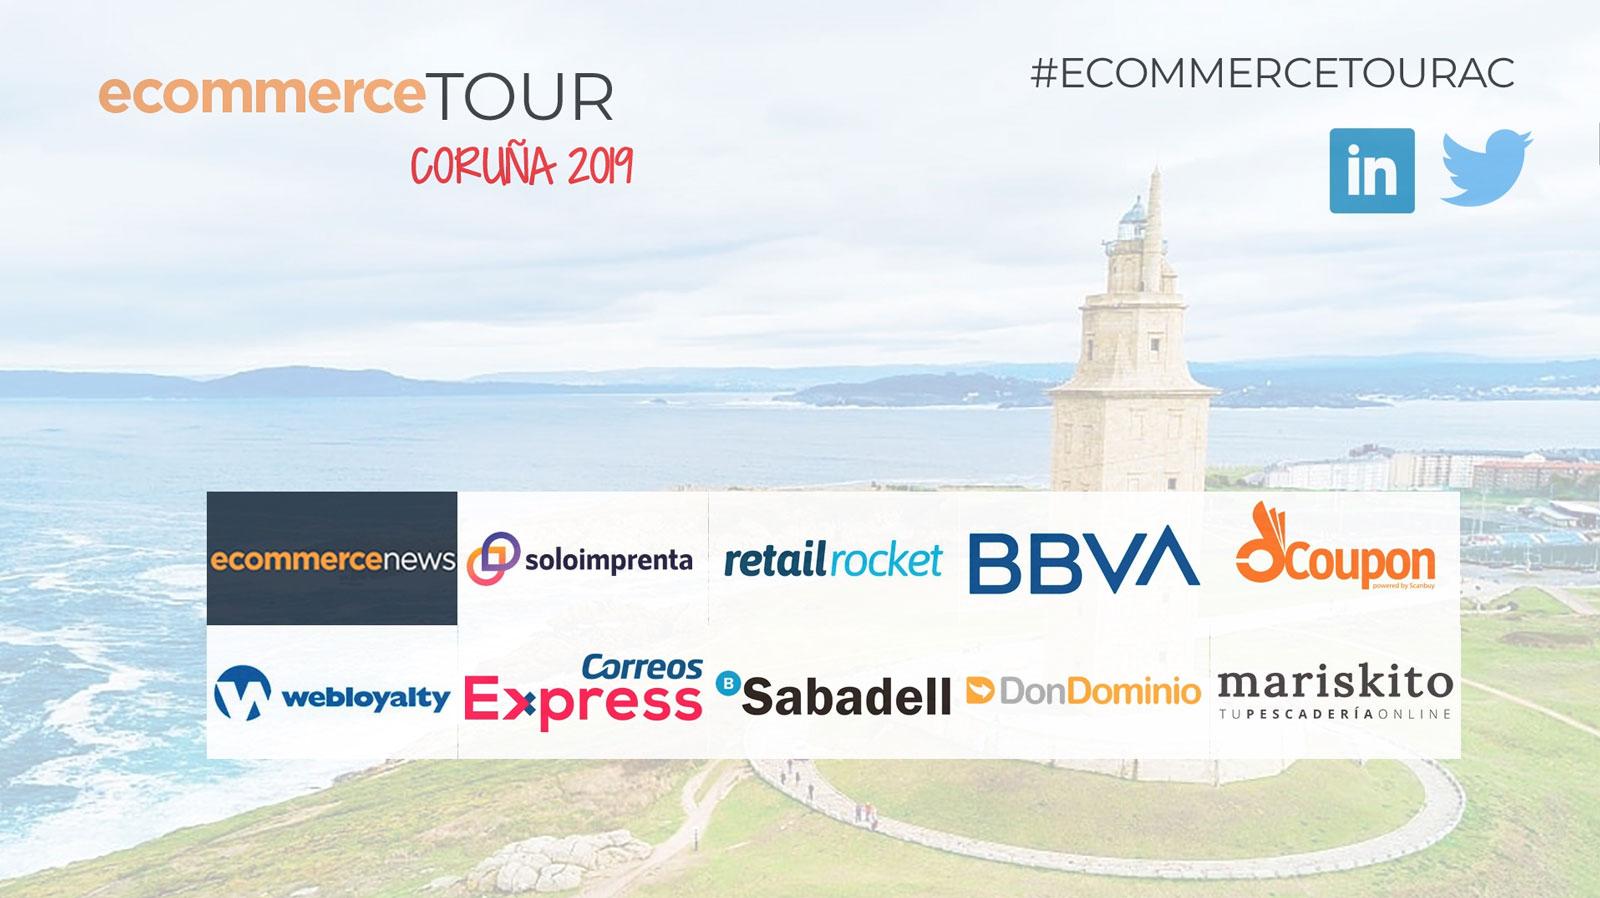 Ecommerce Tour Acoruña